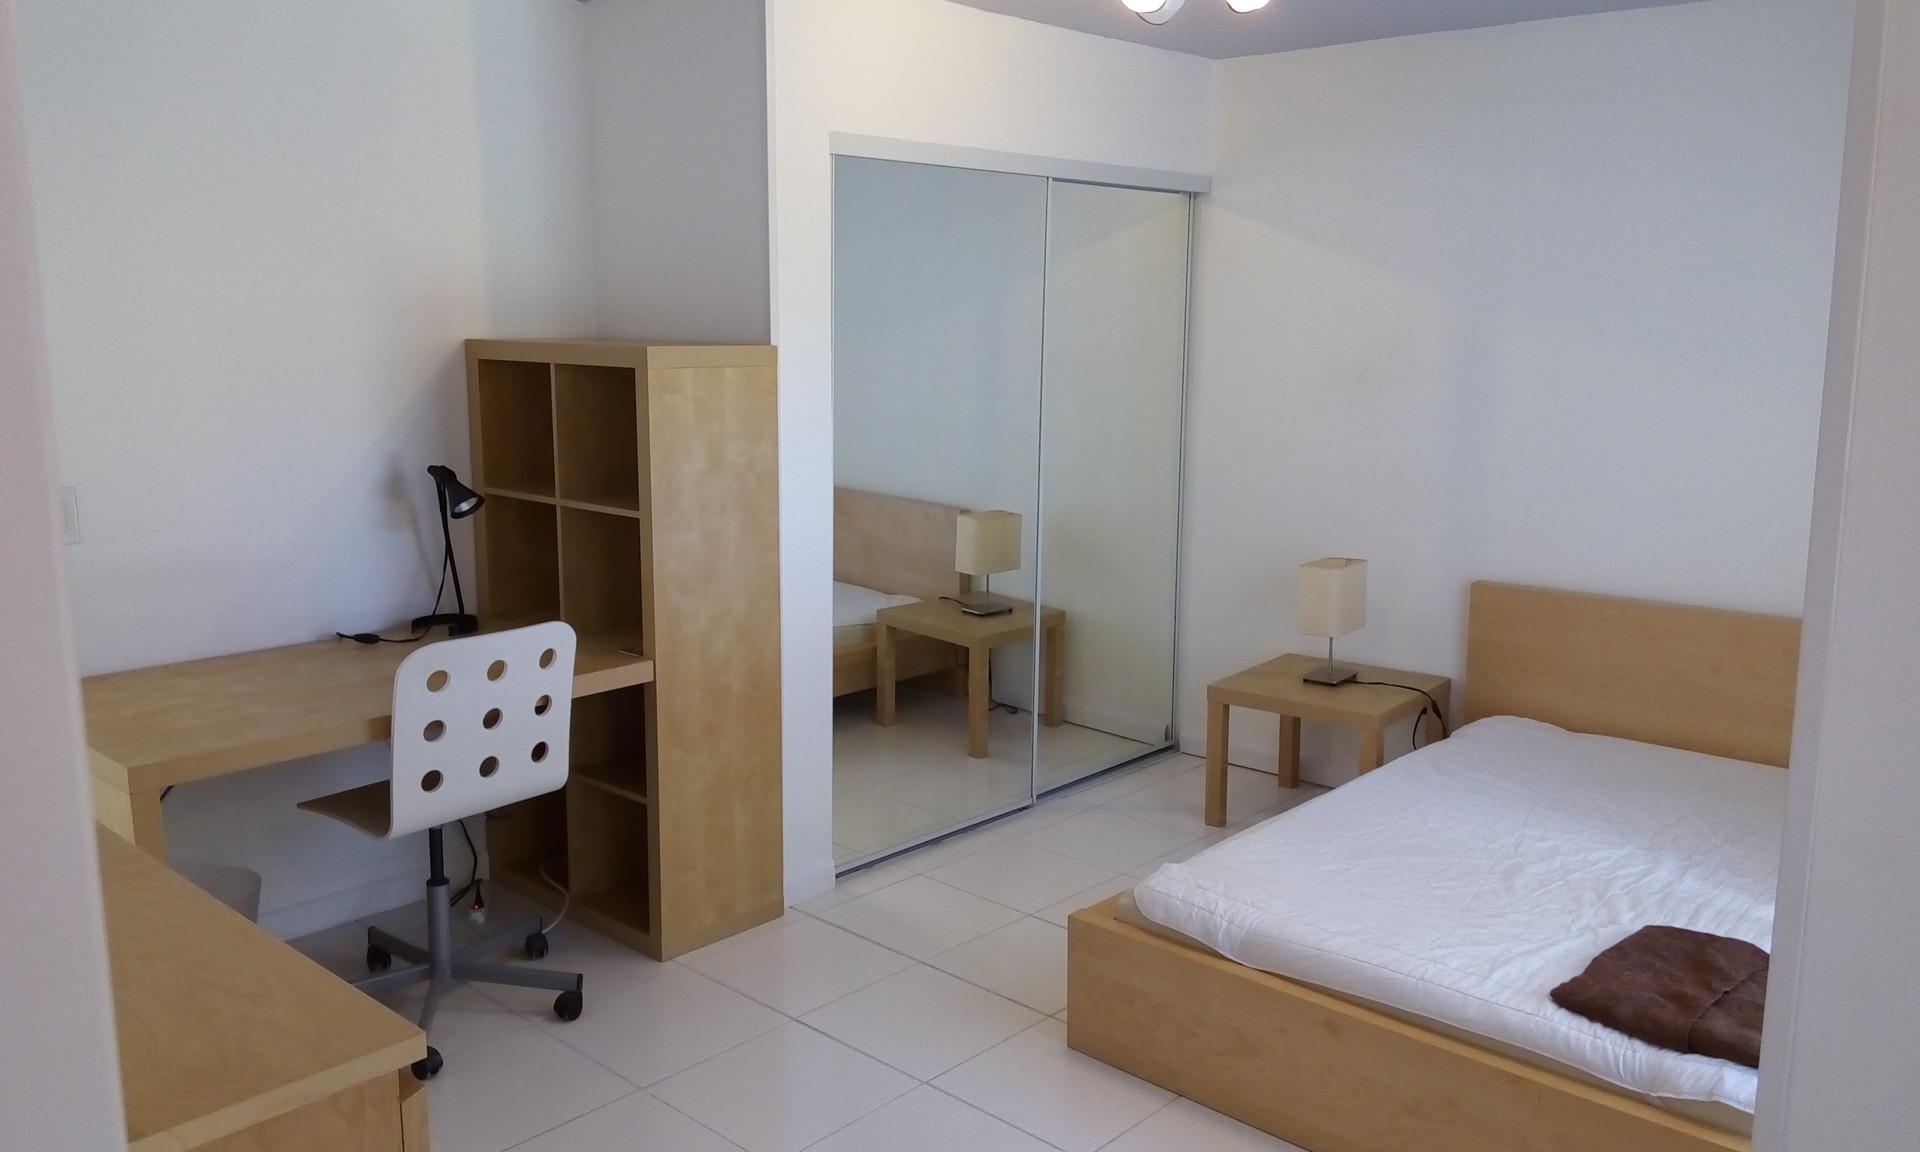 Modern apartment 15 min away from Florida international University